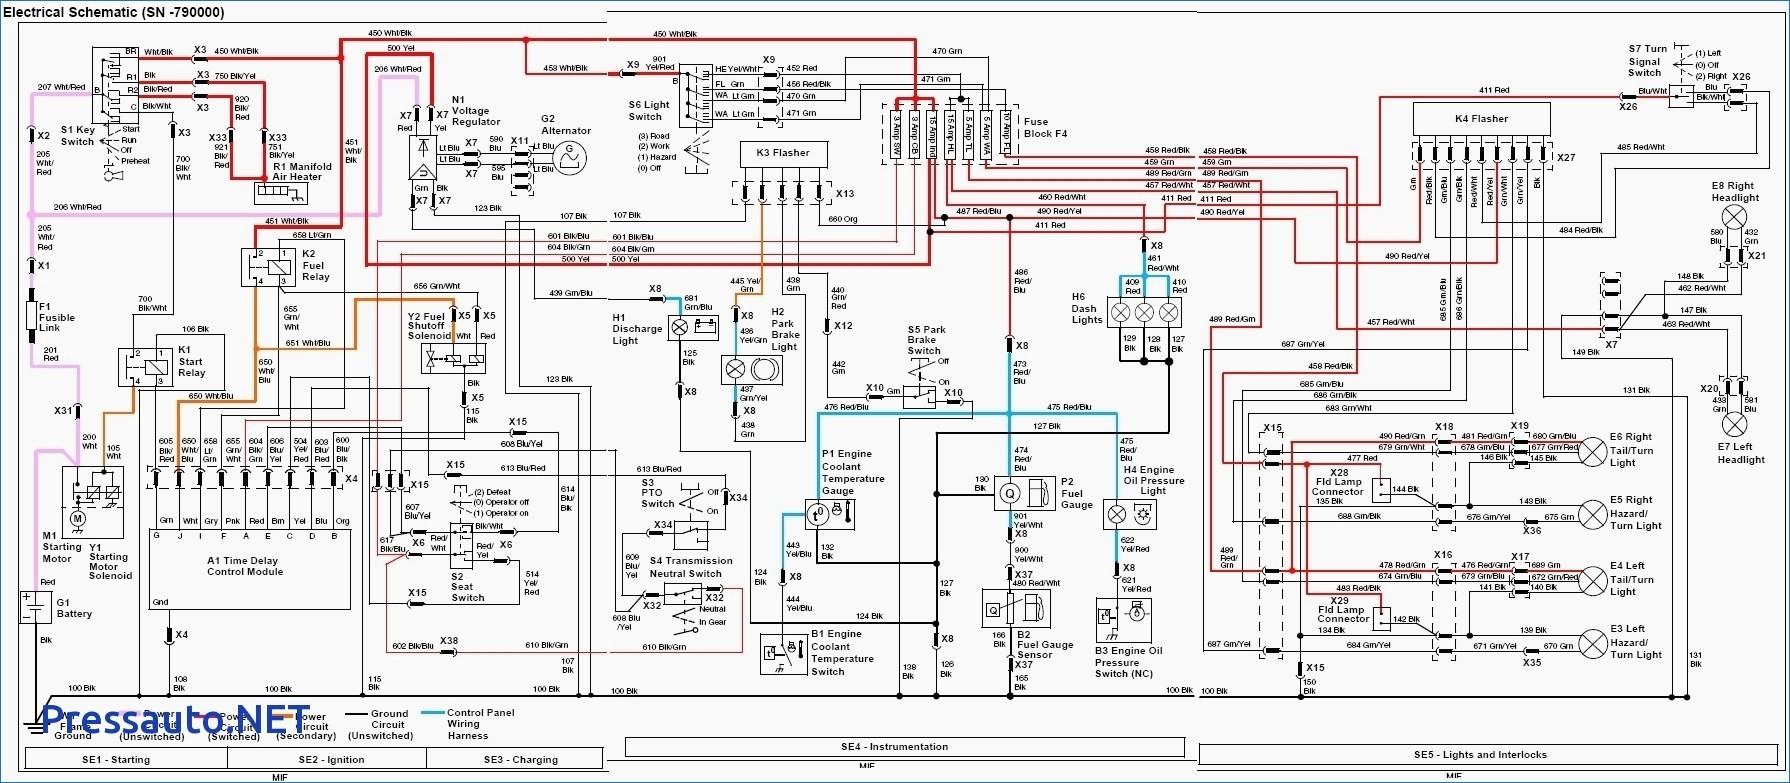 John Deere 445 Electrical Diagram Experts Of Wiring Opel Blazer Montera 345 Download Diagrams Z445 Tractor